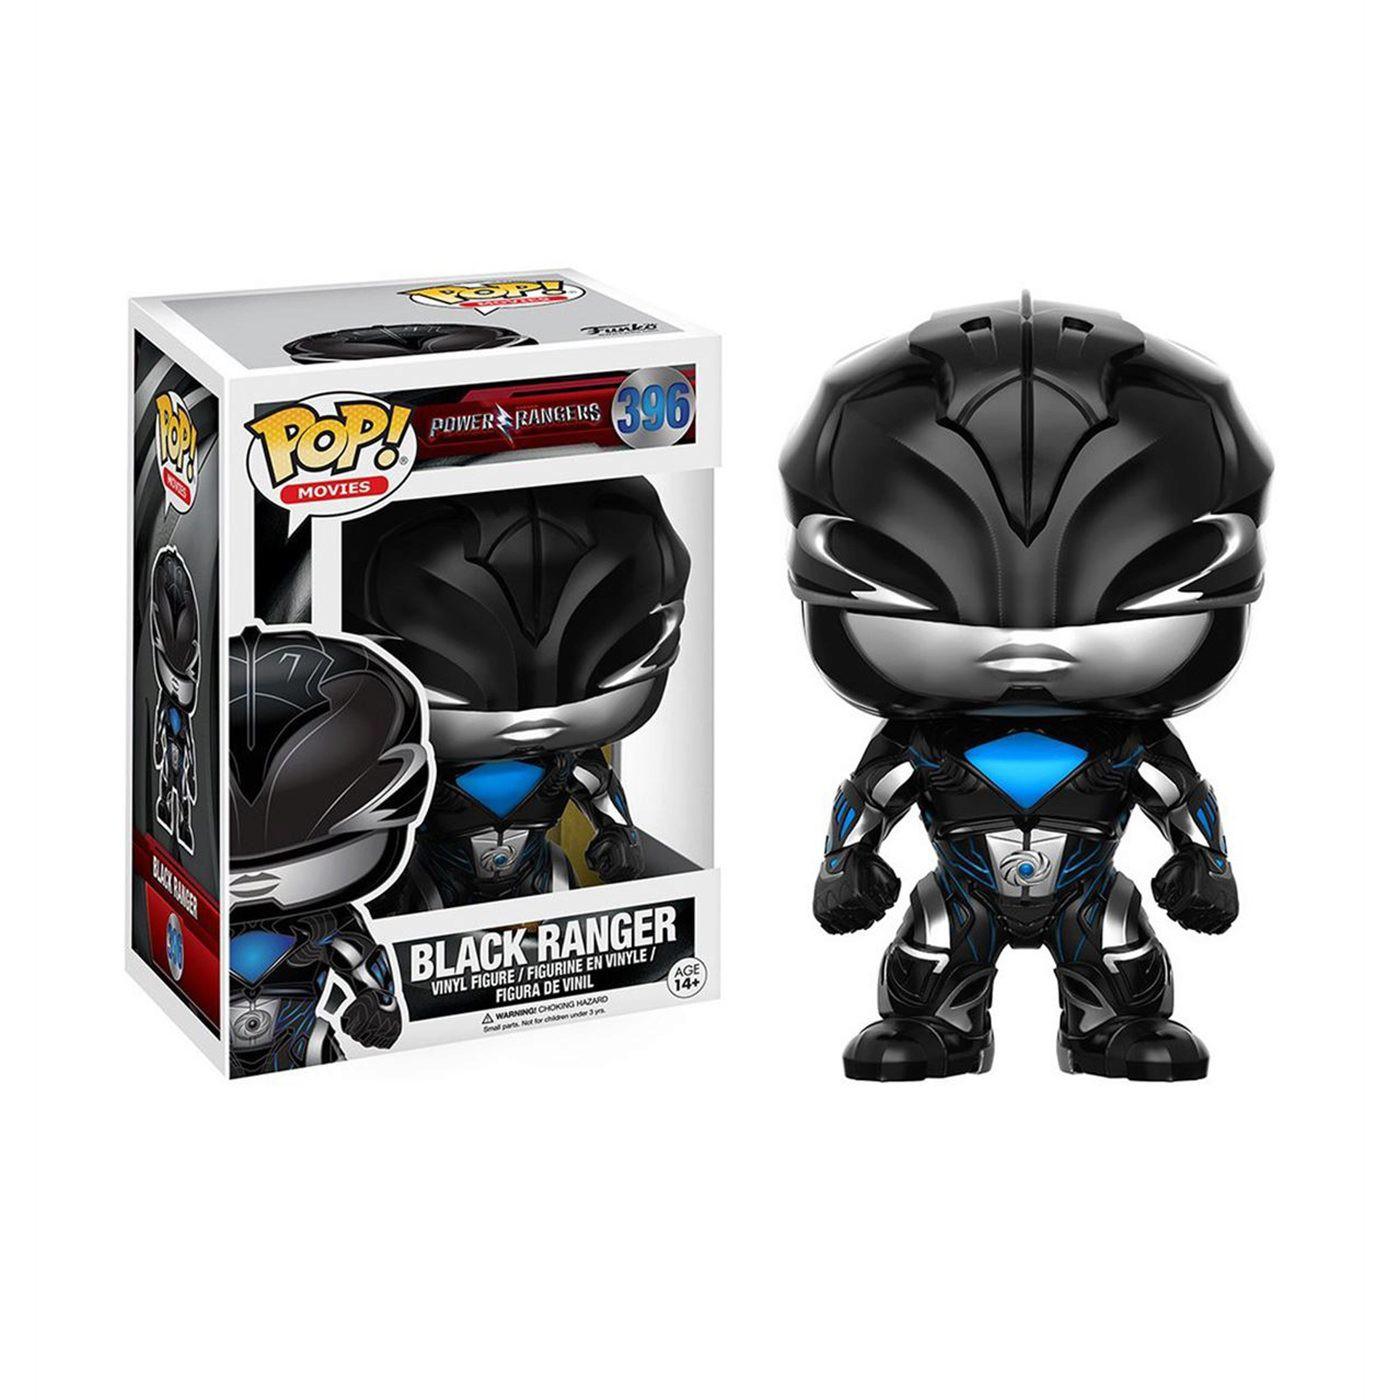 Power Rangers Movie Black Ranger Pop Vinyl Figure